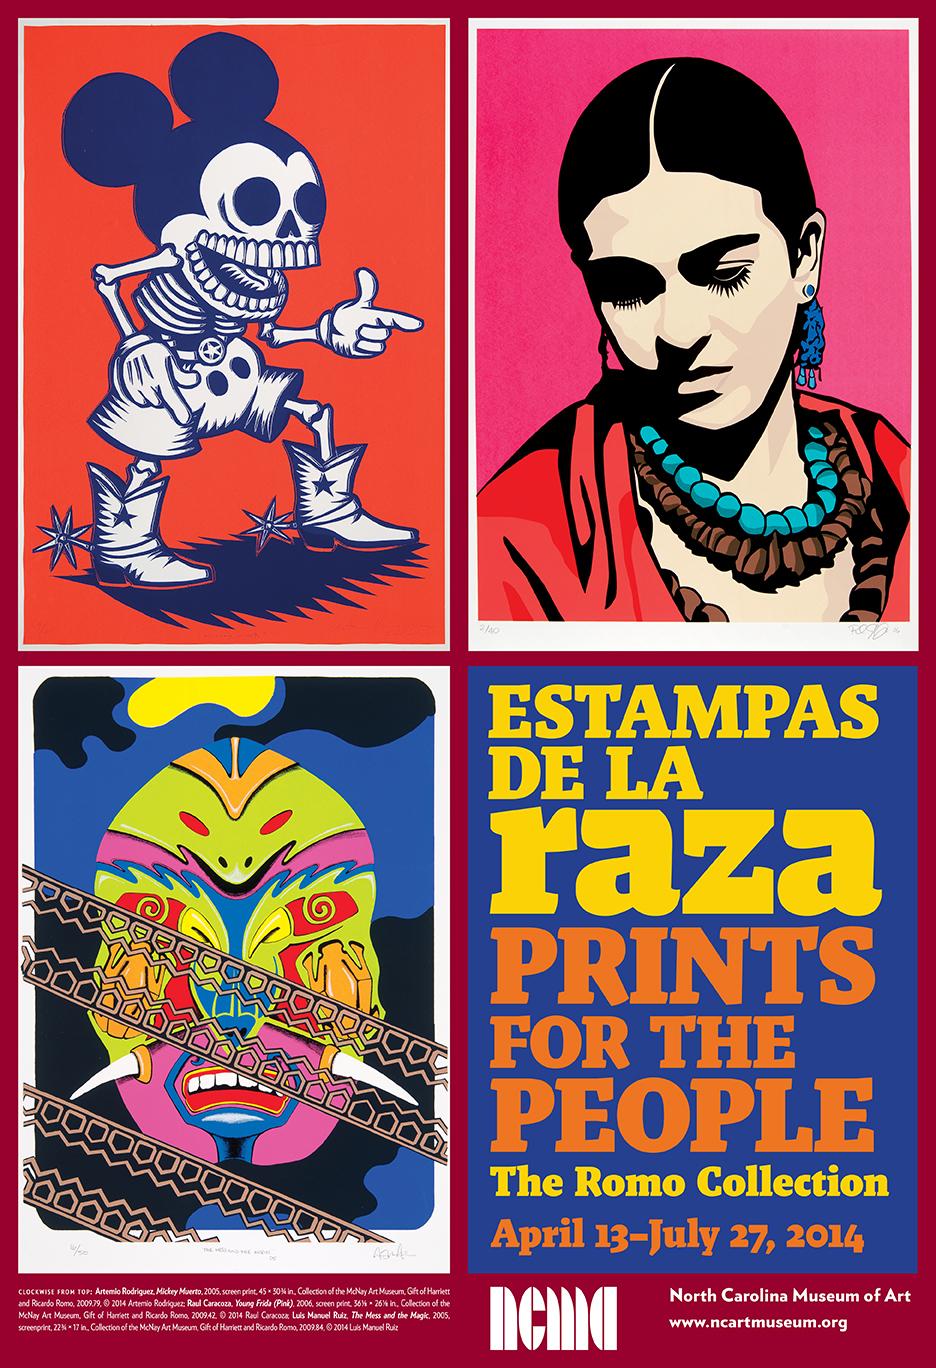 Promotional poster for  Estampas de la Raza/Prints for the People